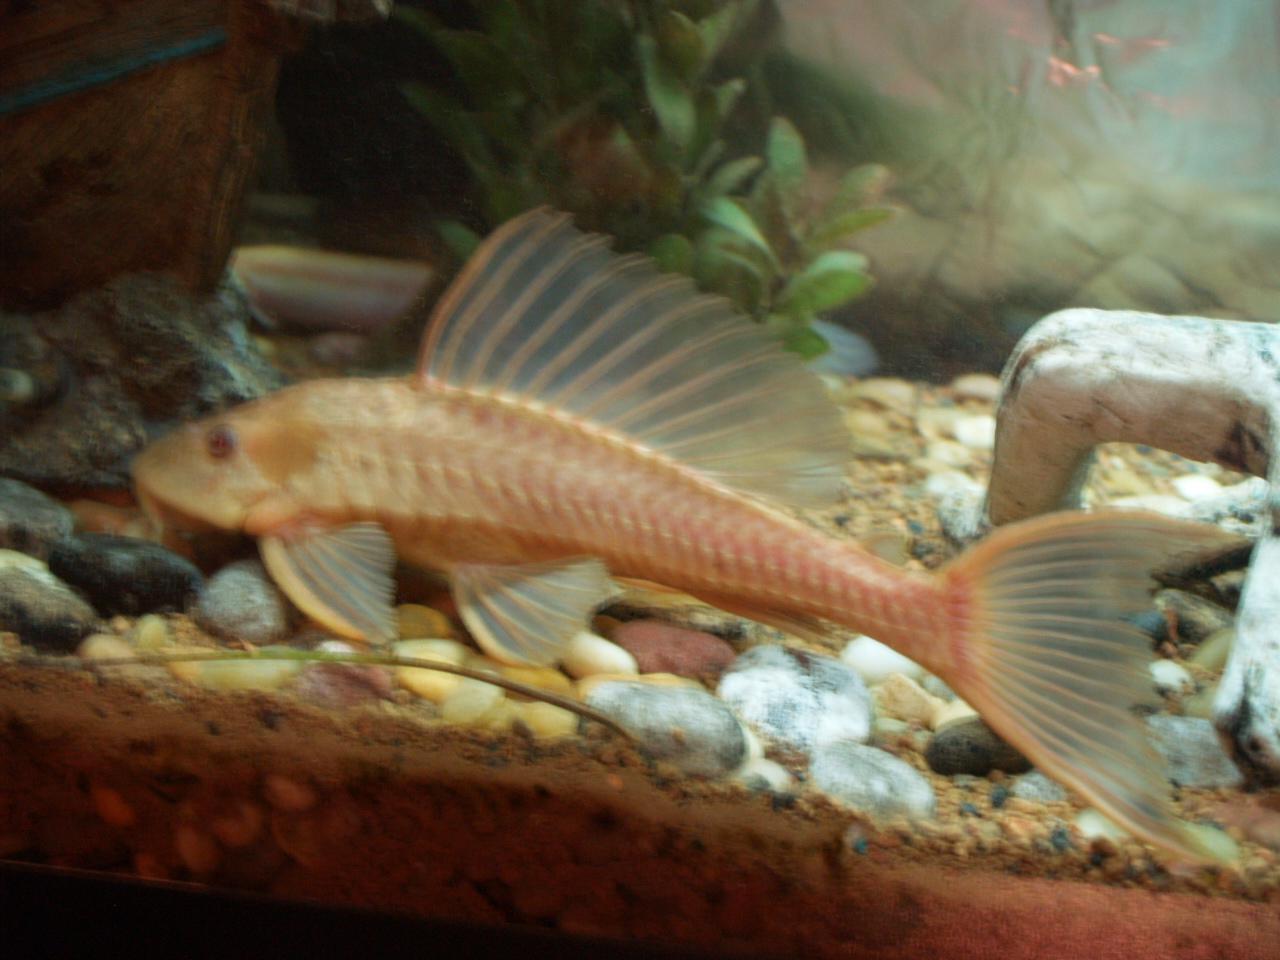 Ugly freshwater aquarium fish - Br030217 Jpg